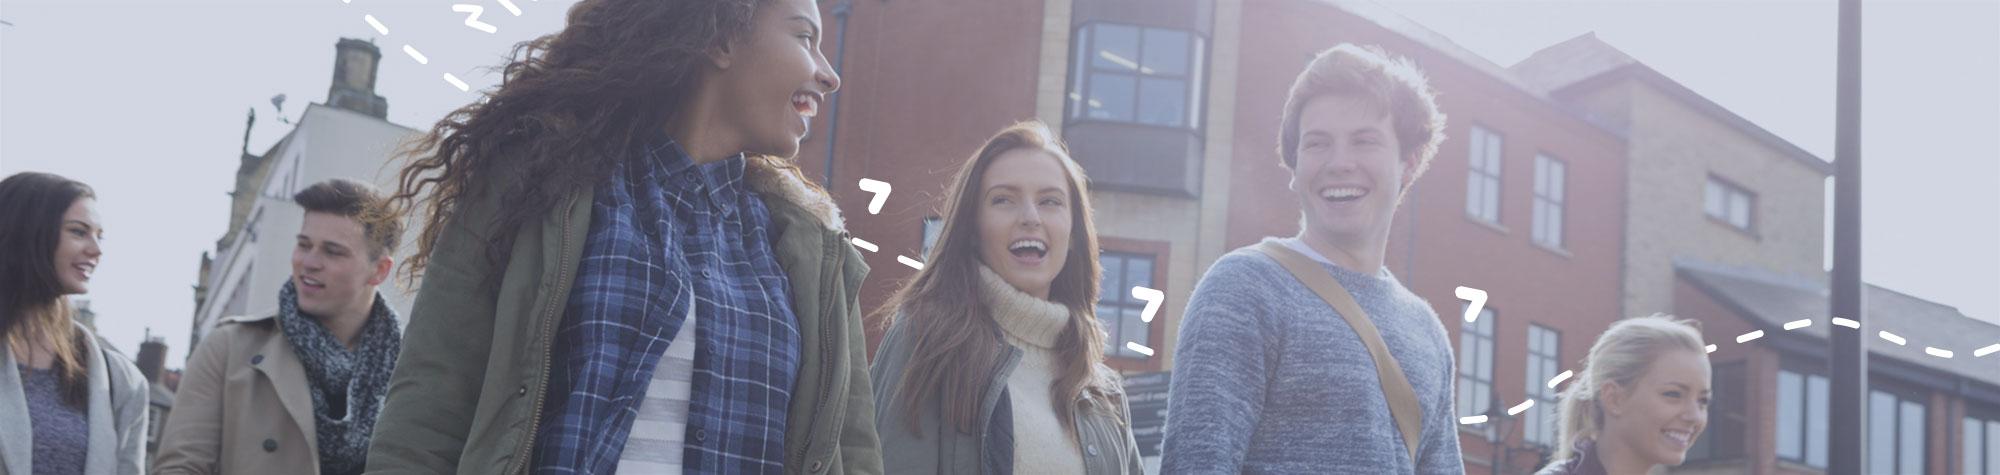 TwentyTwenty scelta da StudyTours per la gestione dei canali social